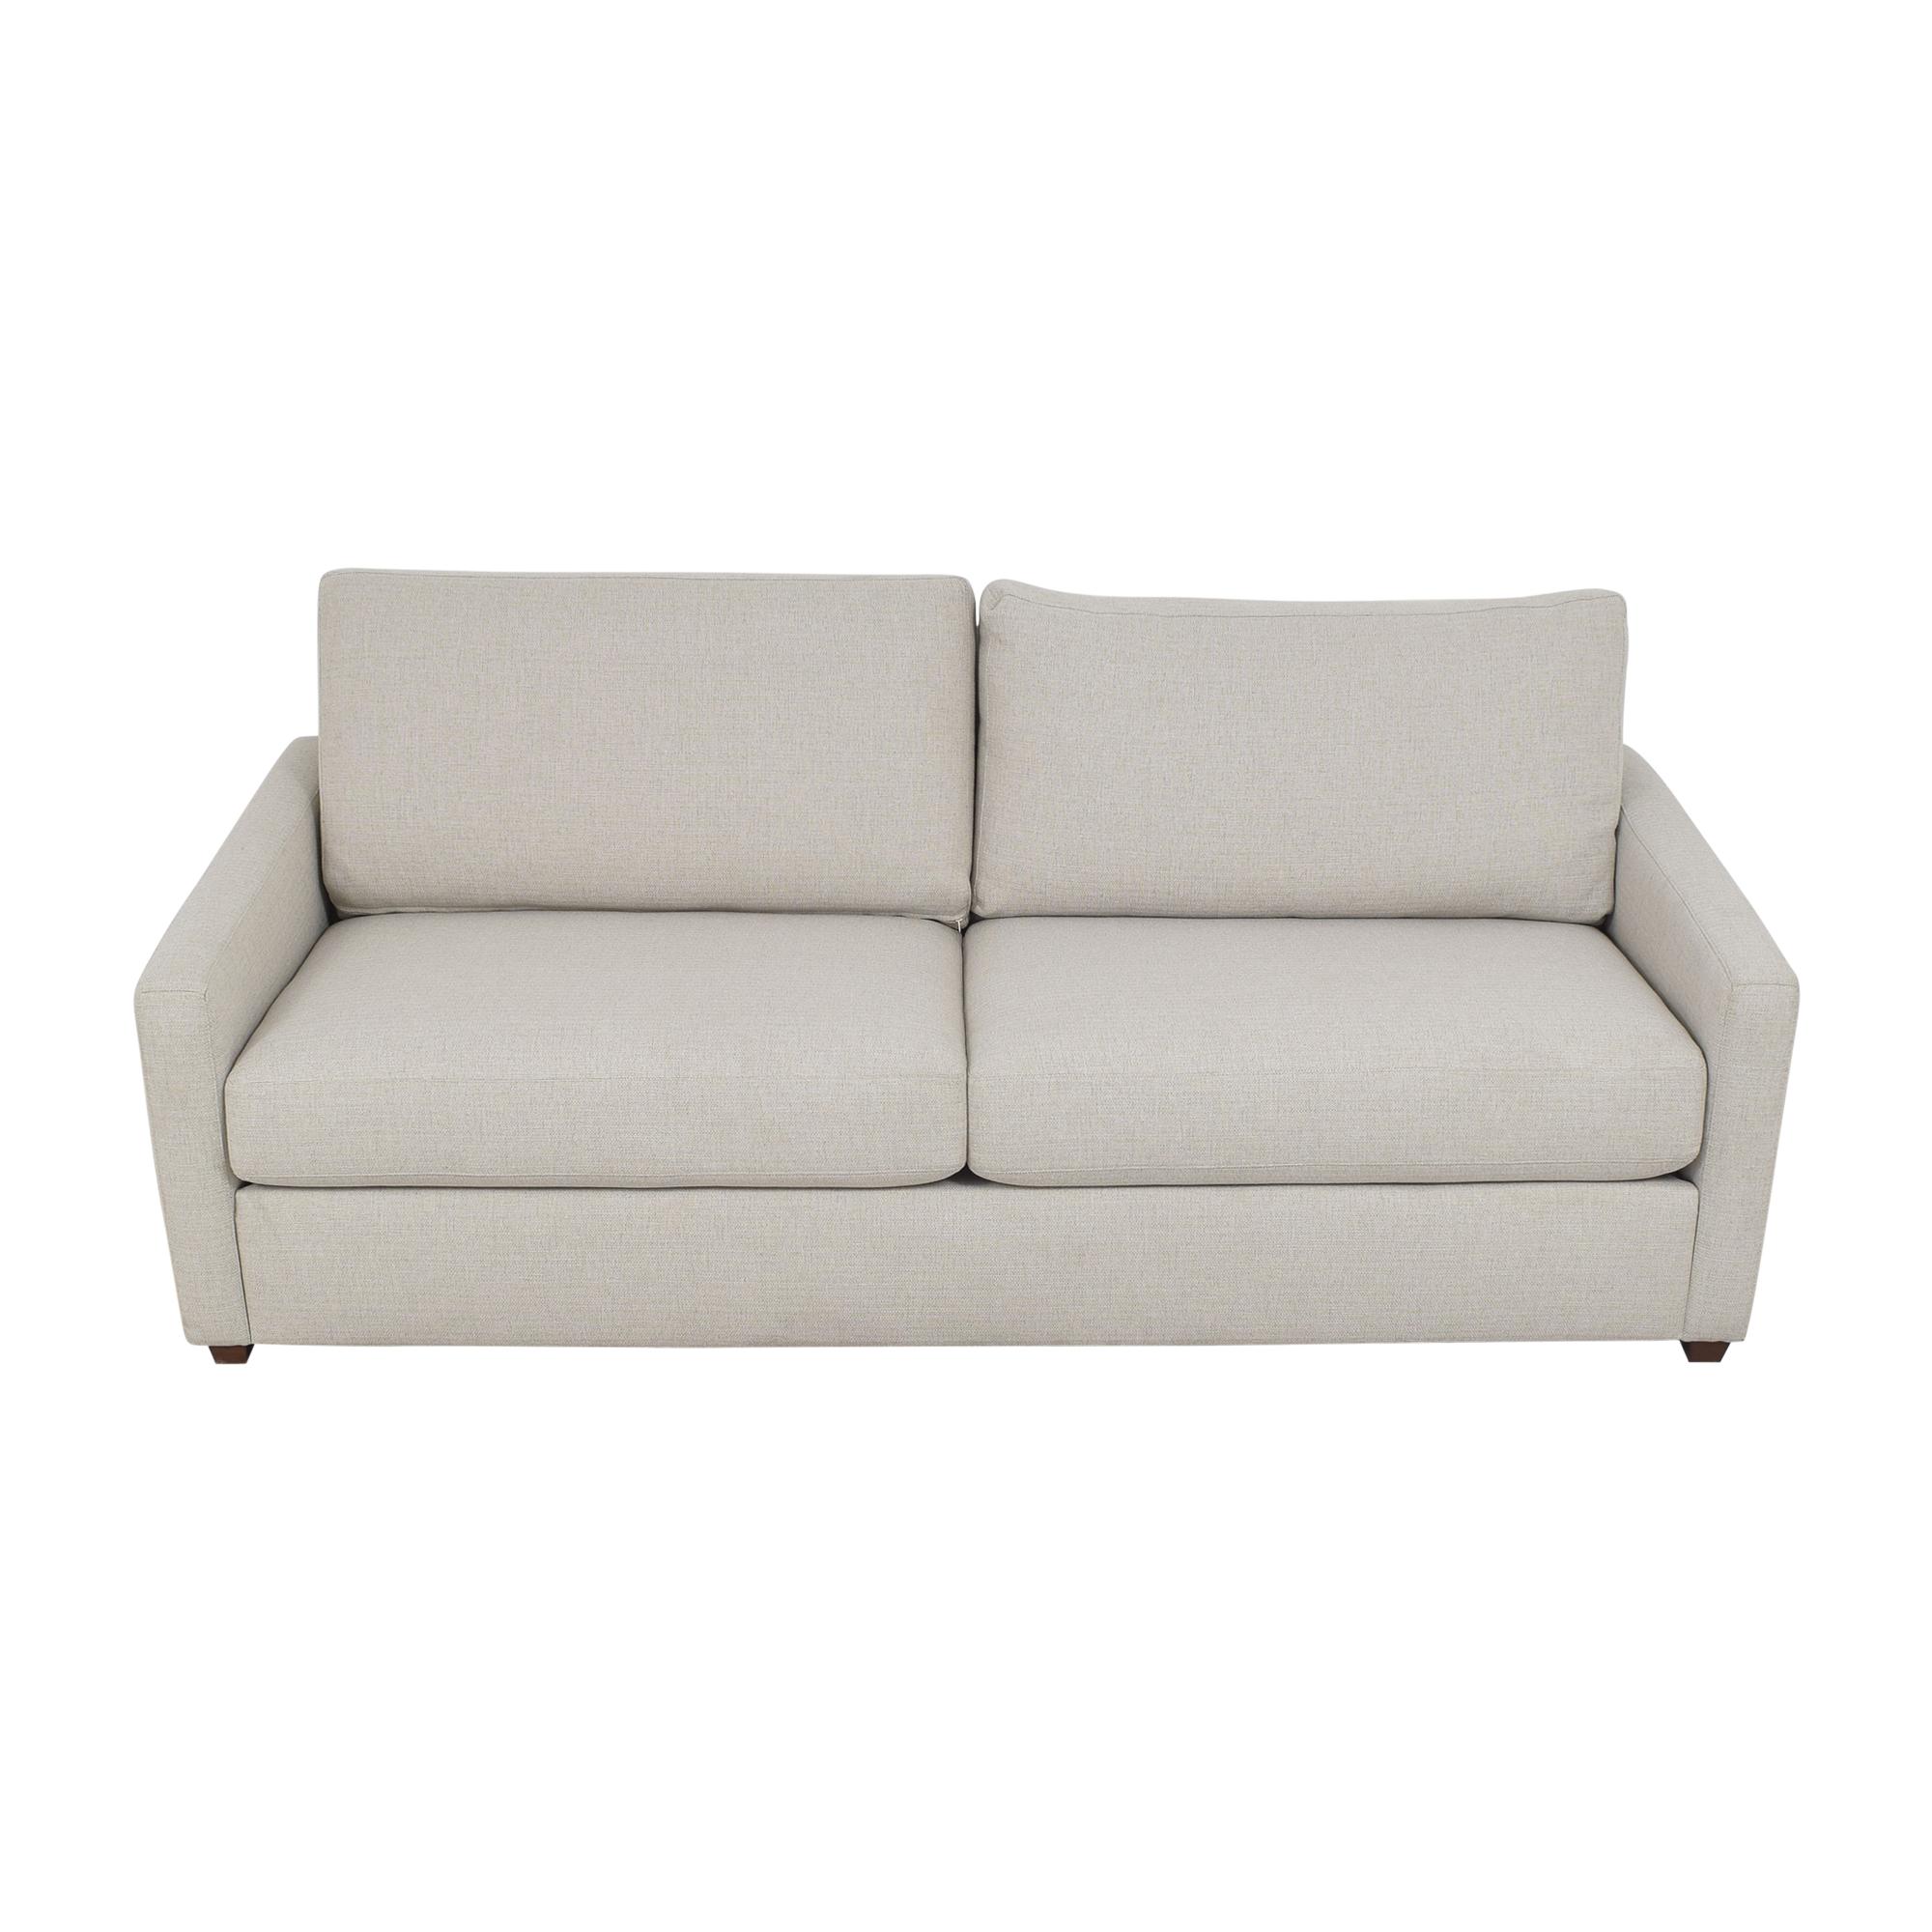 BenchMade Modern BenchMade Modern Couch Potato Lite Sofa discount